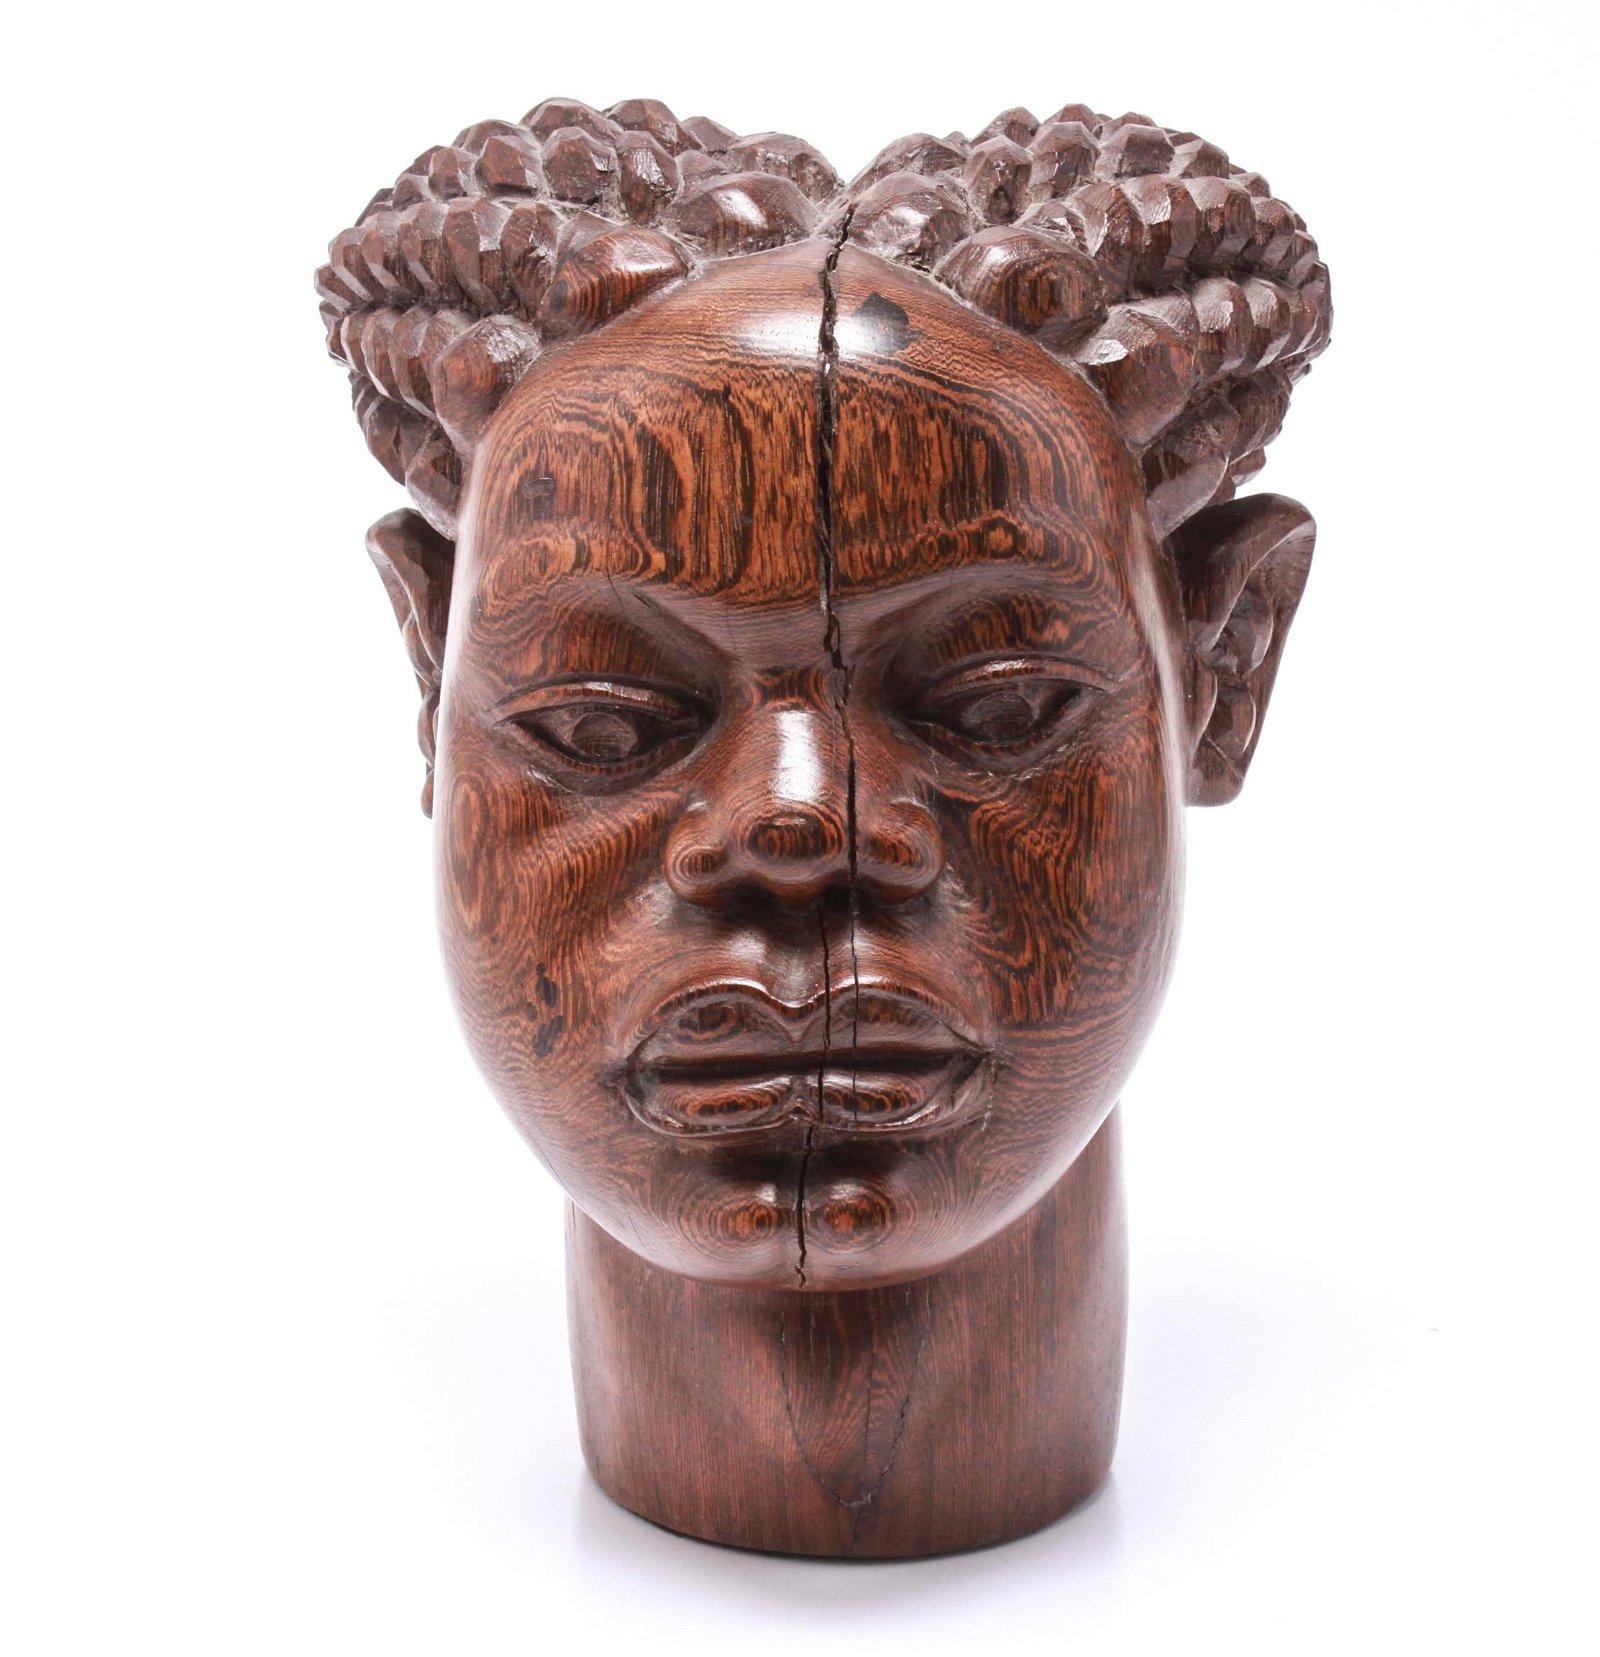 African Carved Wood Portrait of Figure Sculpture